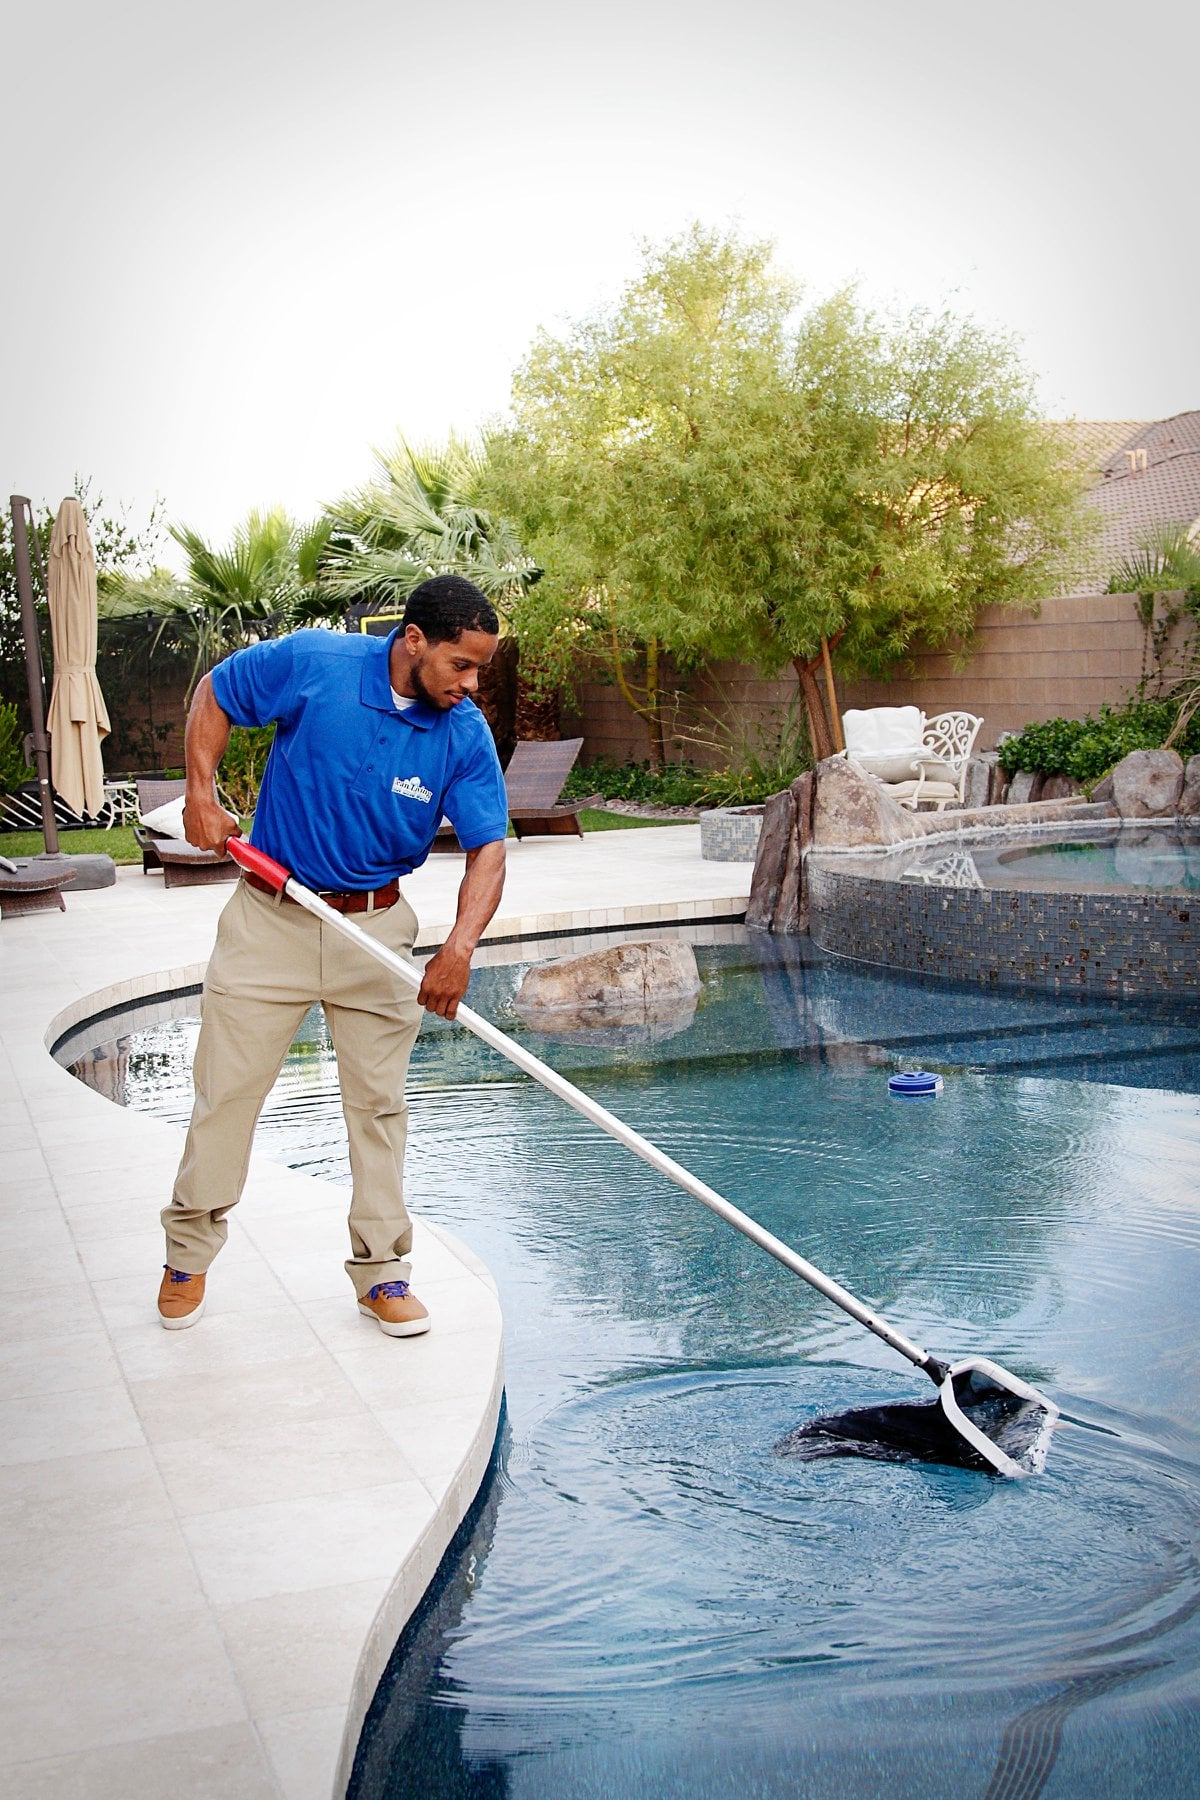 Pool guy cleaning pool